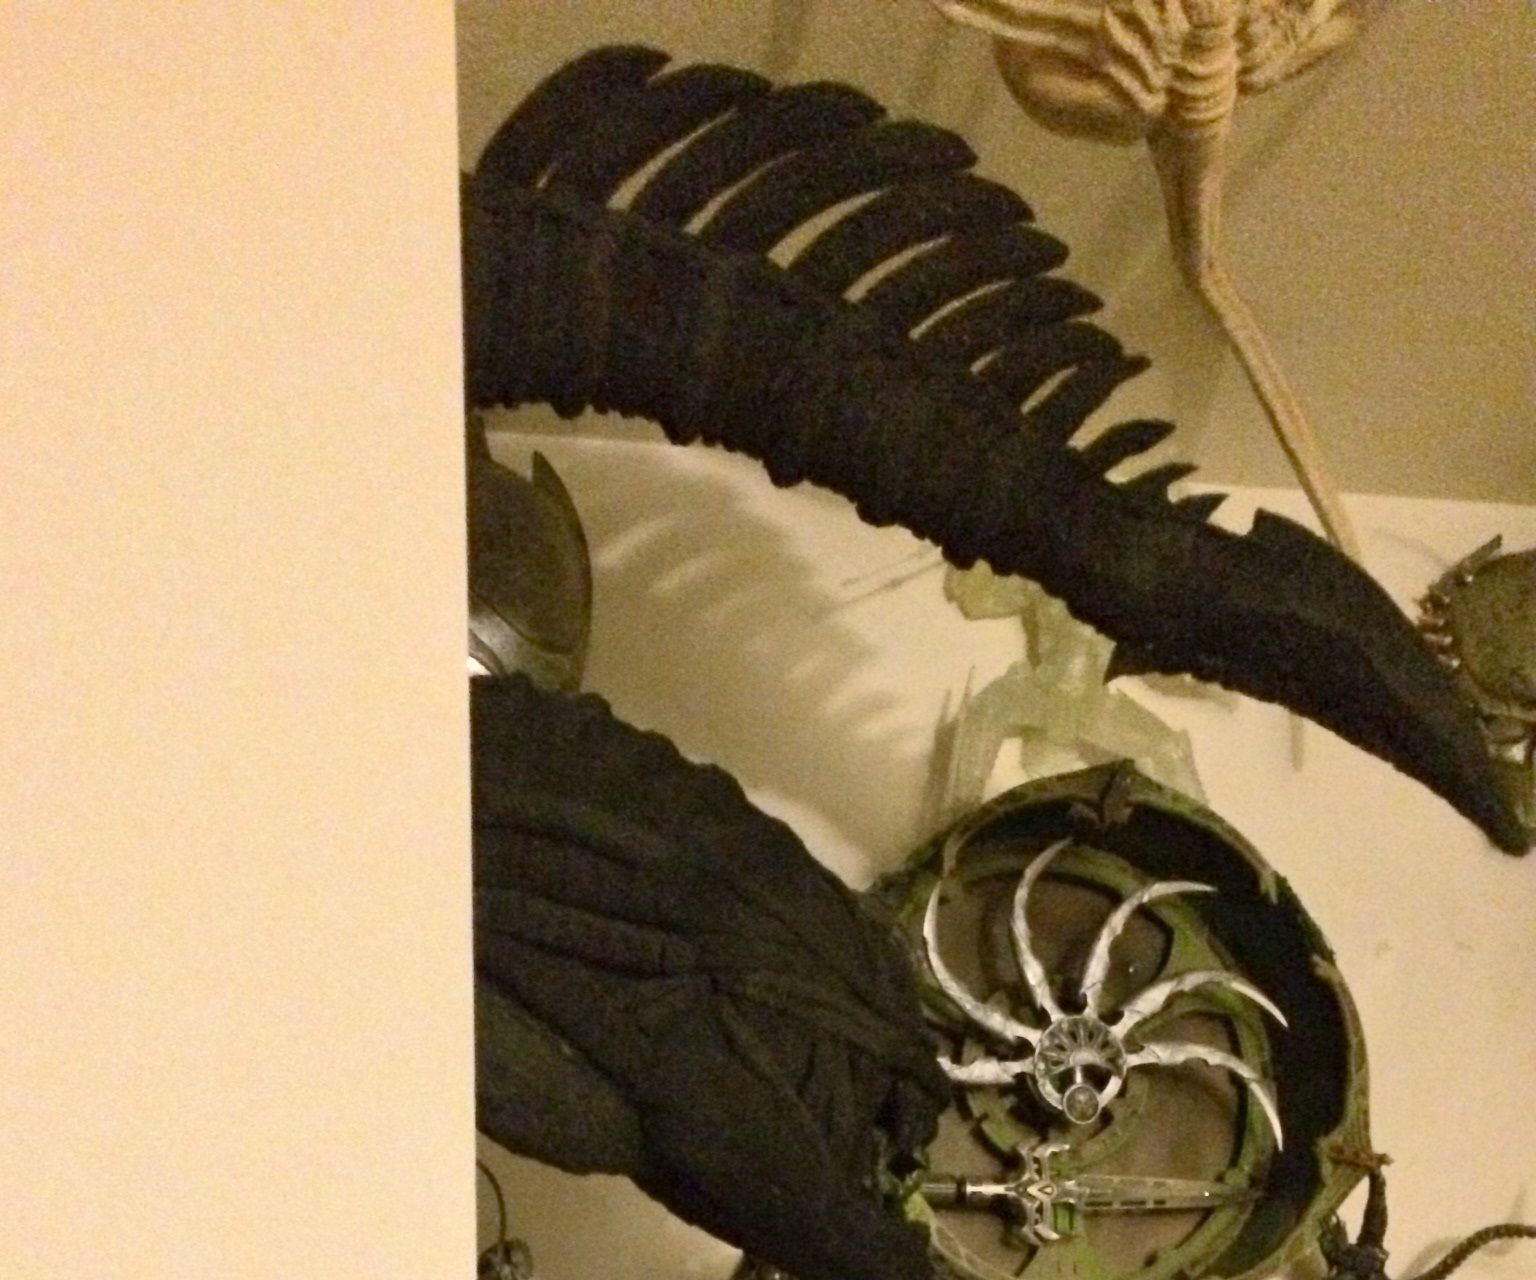 Xenomorph Alien Head foam sculpture